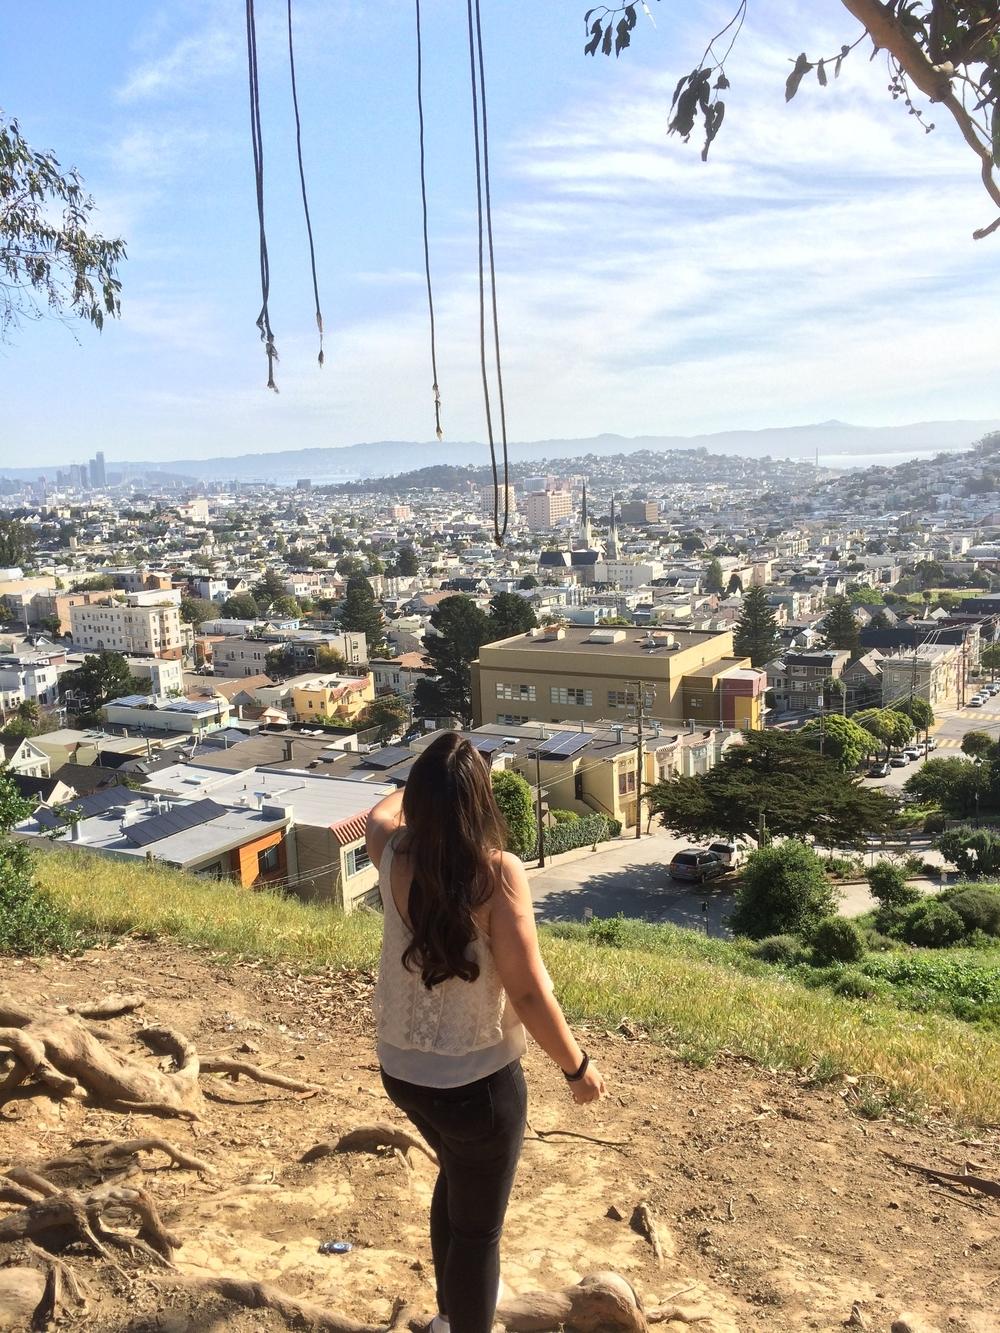 San_Francisco_Billy_Goat_Hill_Park_2